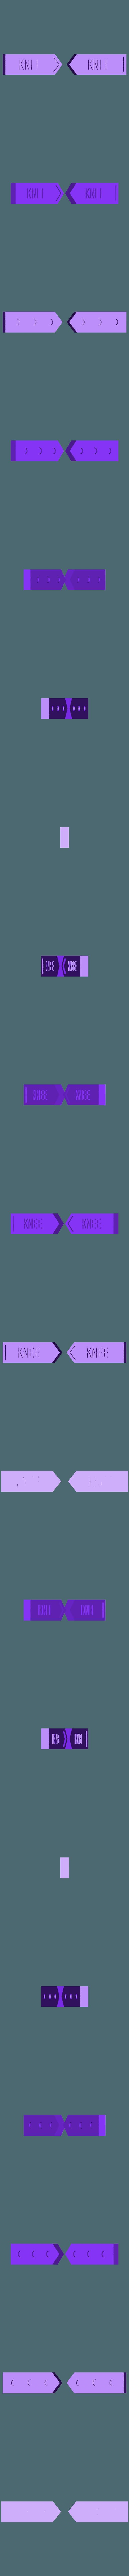 Knee.stl Download free STL file Body Part Arrow Magnets • 3D printable model, EmbossIndustries